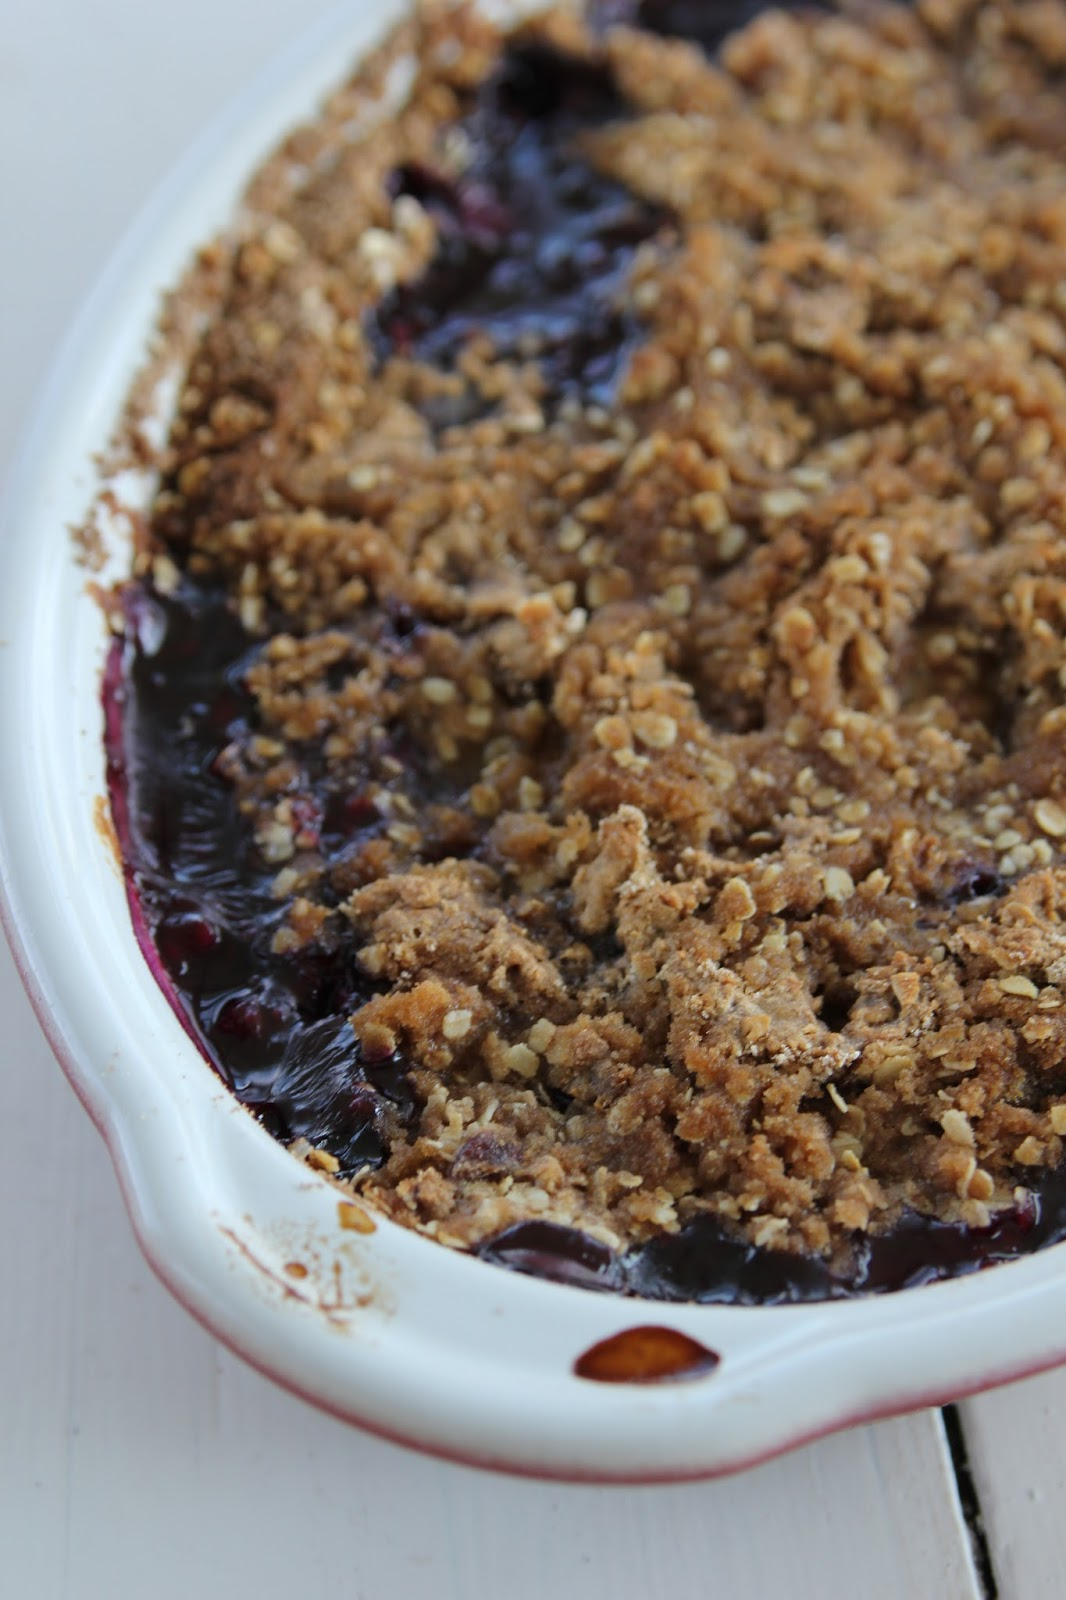 carmen's kitch: Peach and Blueberry Crisp